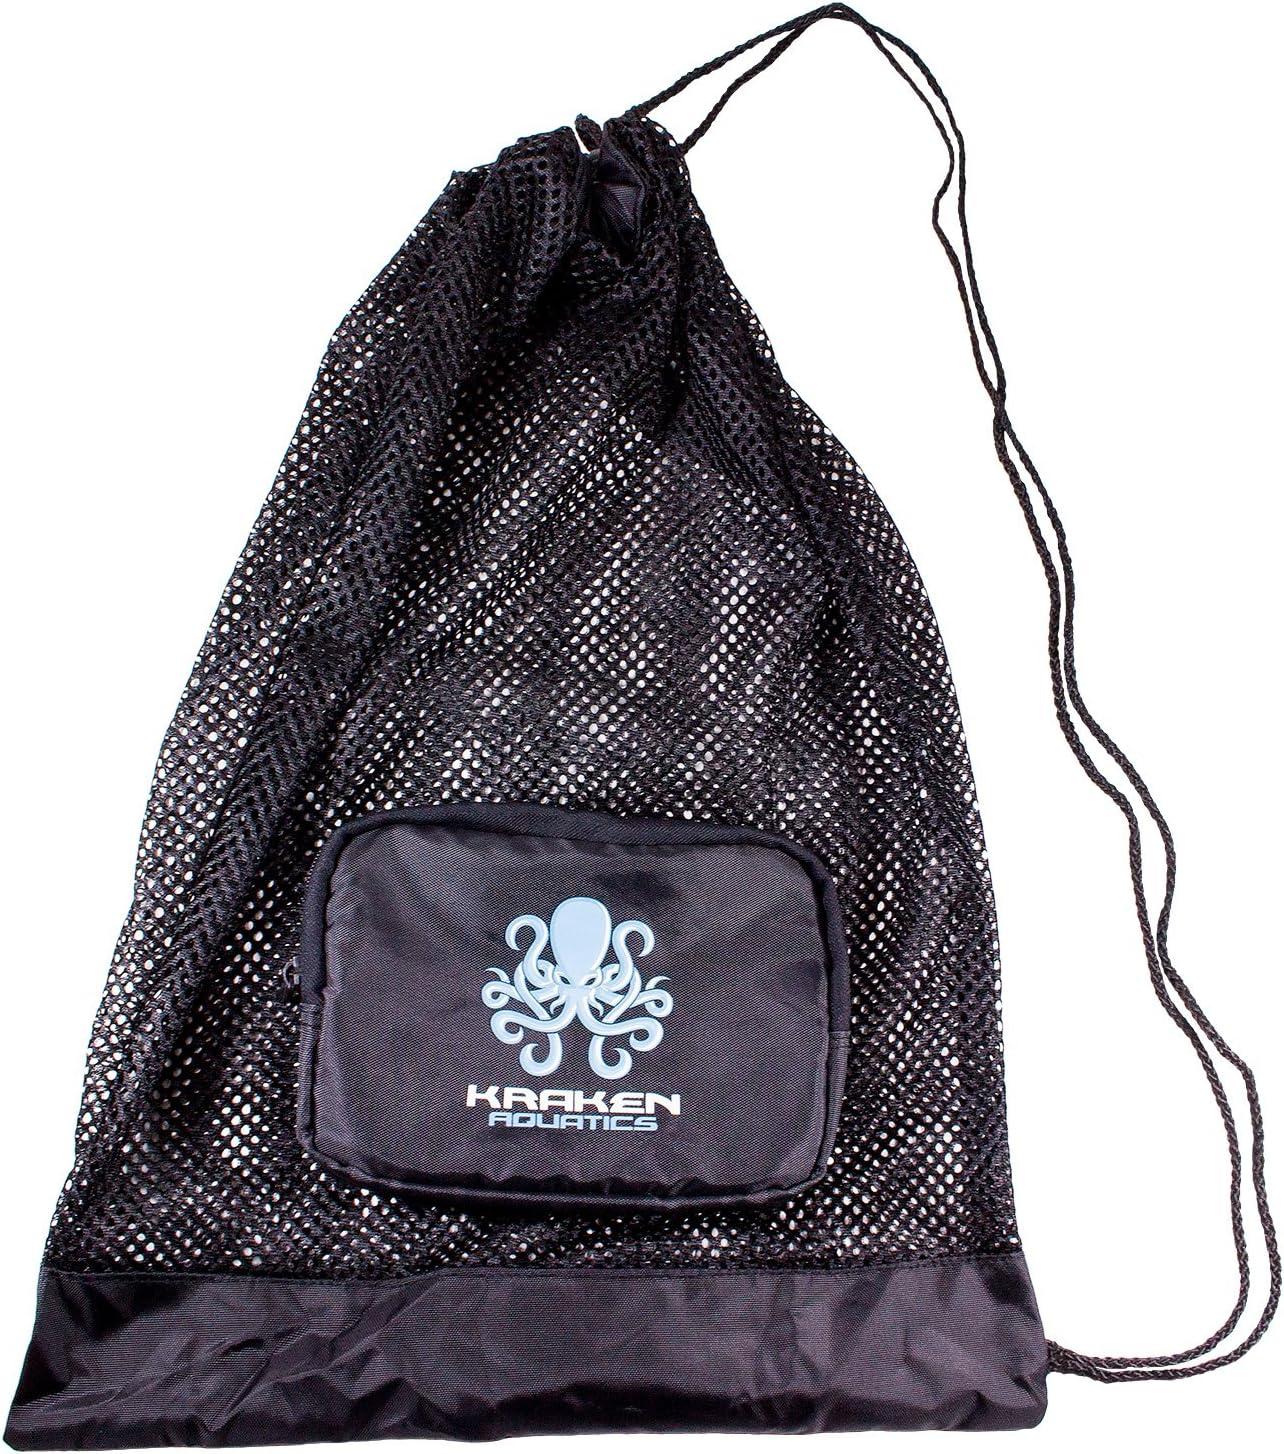 Kraken Aquatics Compact Mesh Gear Diving Manufacturer direct delivery Weekly update for Scuba Snorke Bag